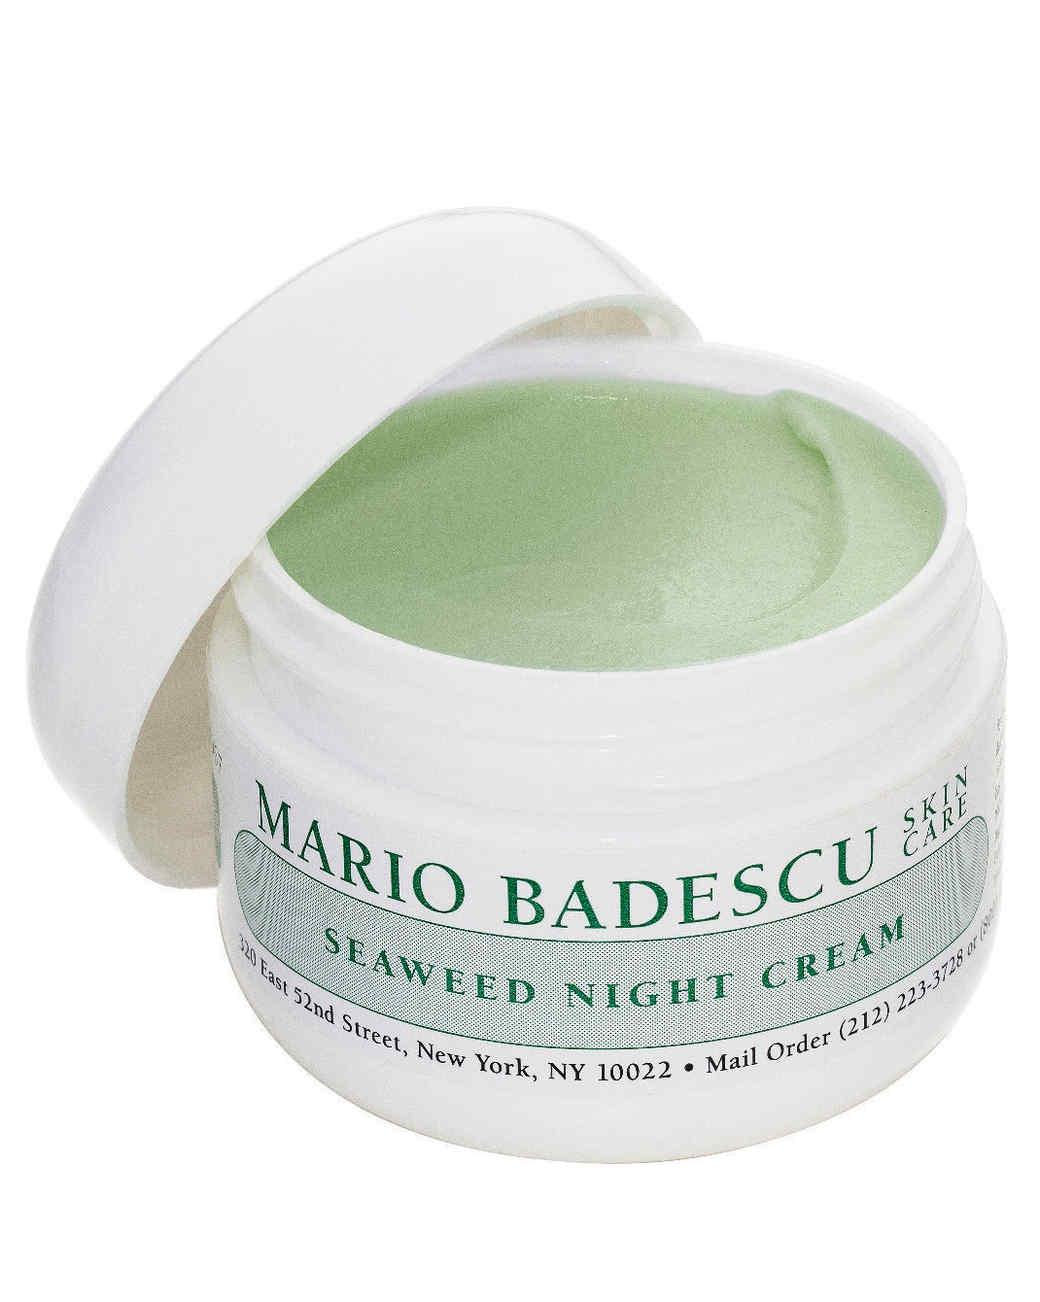 mario-badescu-seaweed-night-cream-0915.jpg